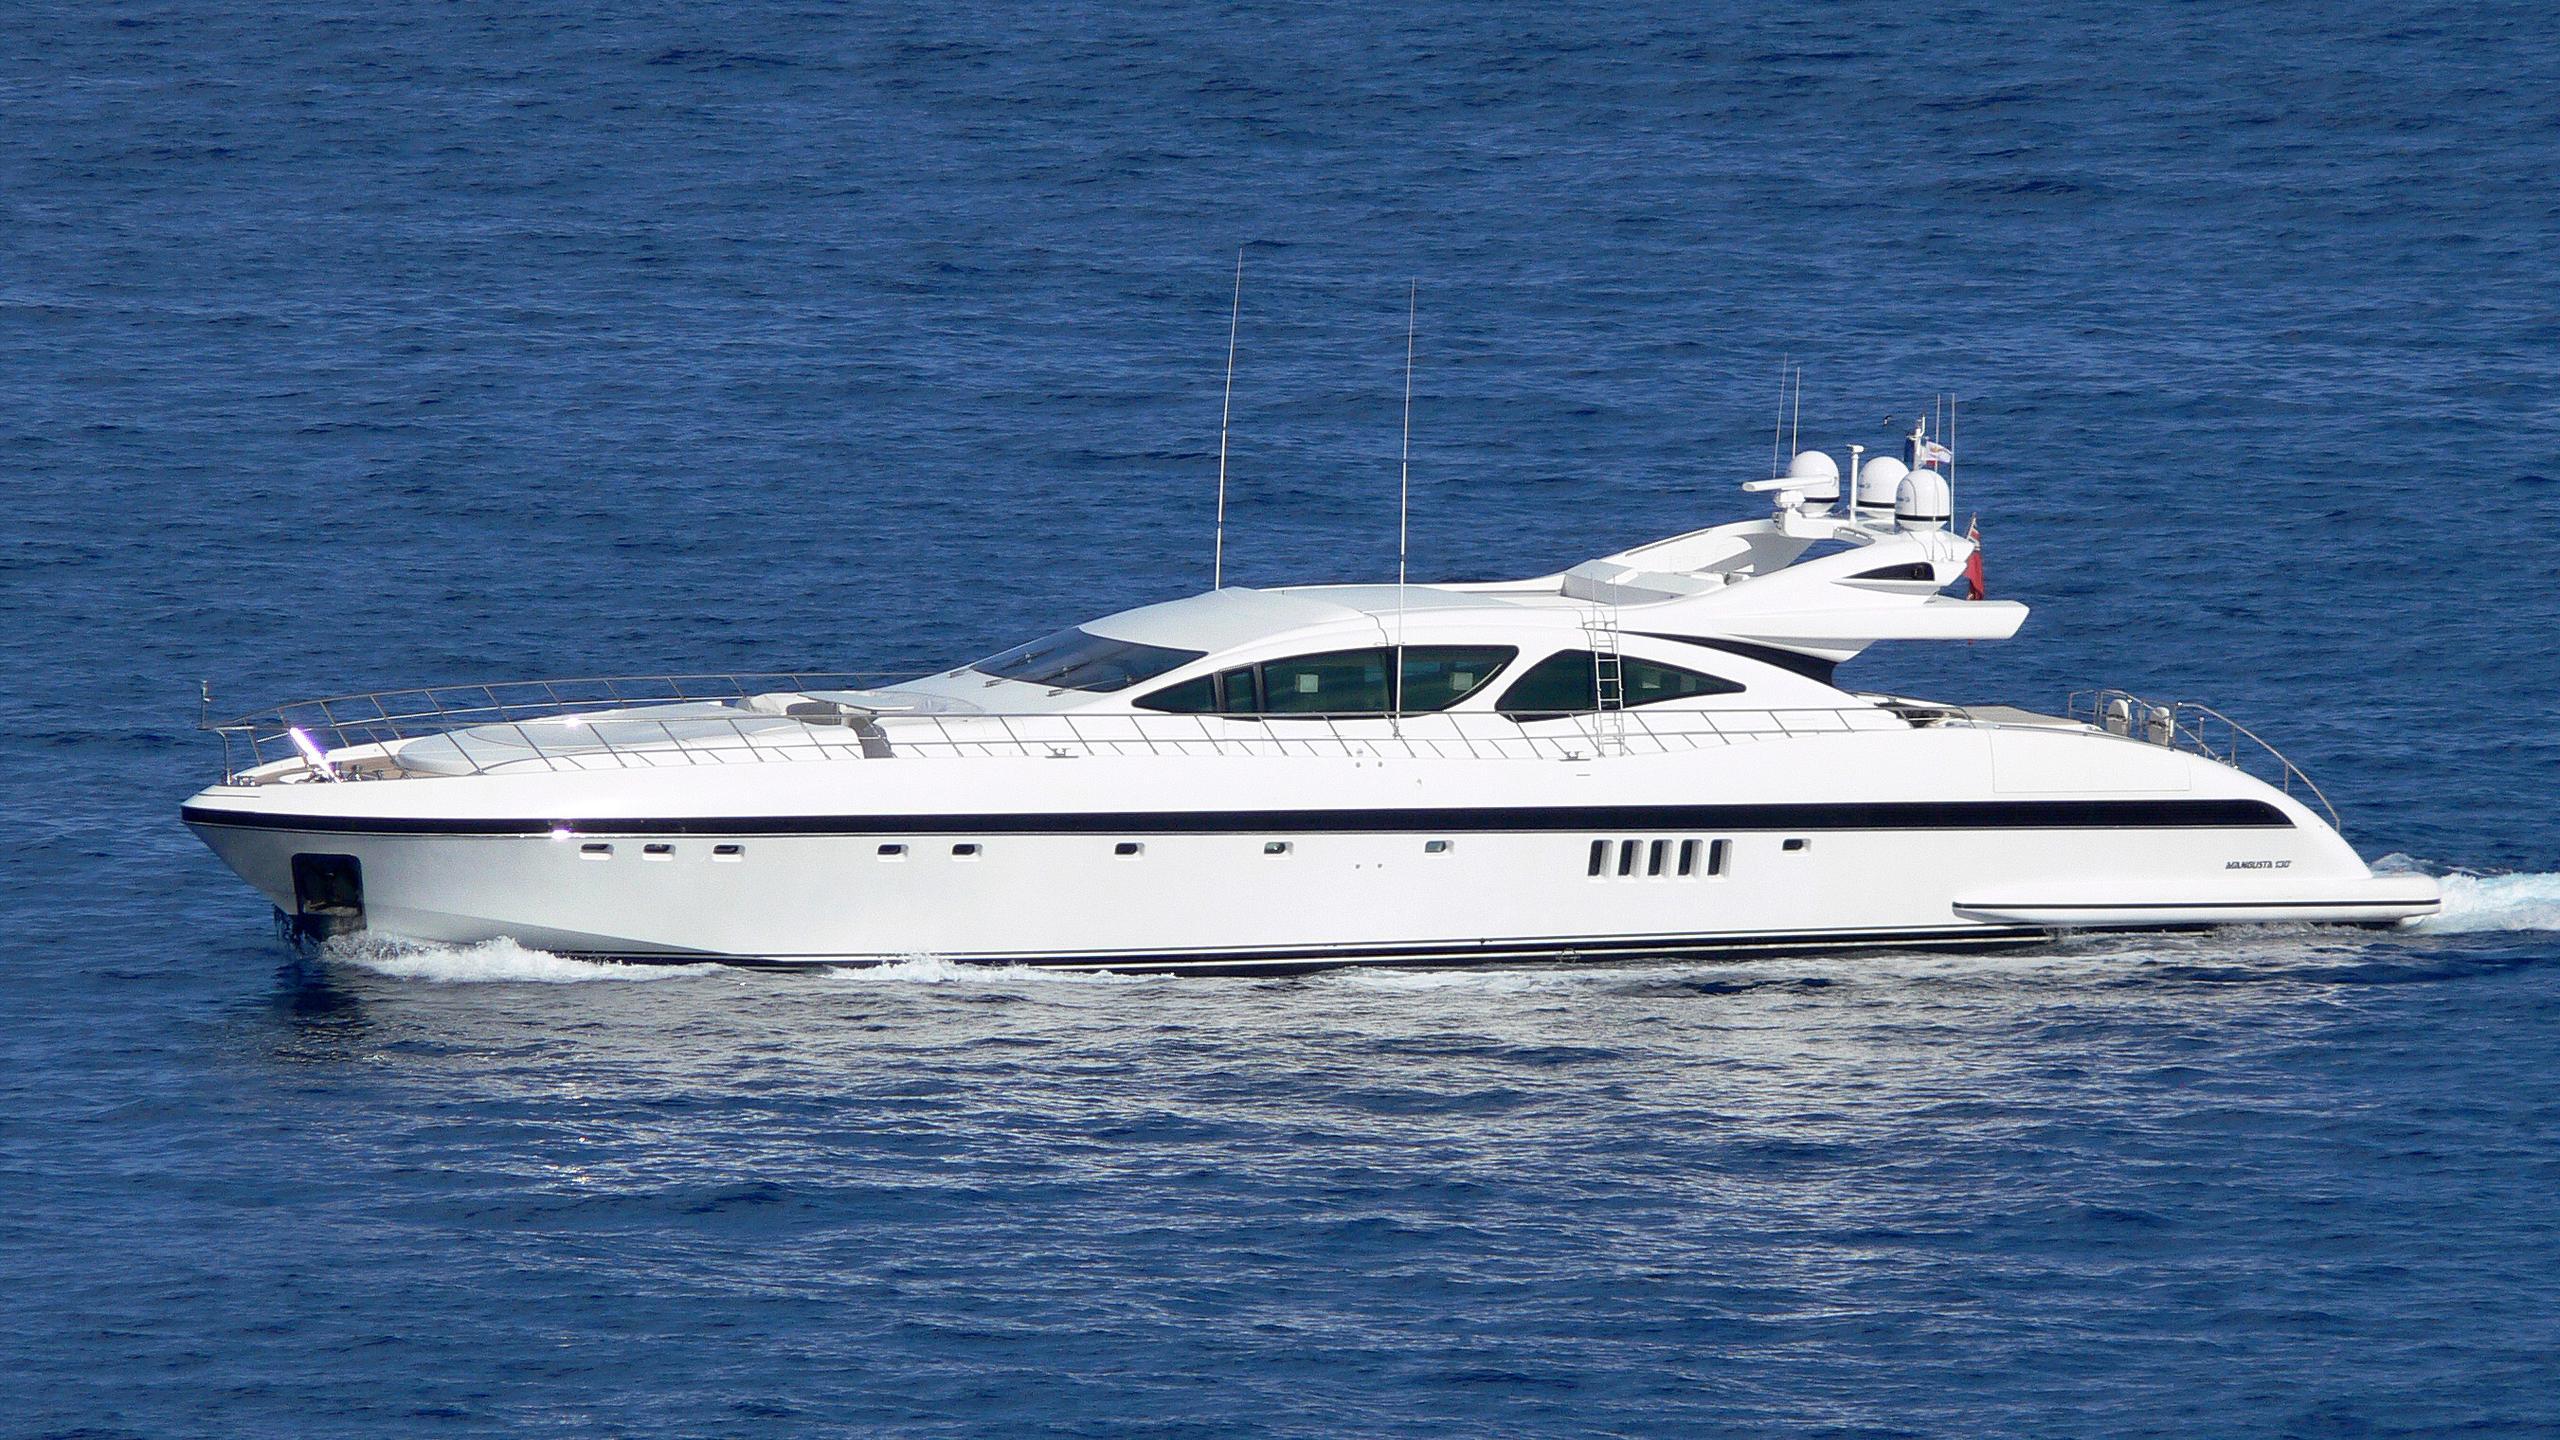 incognito-motor-yacht-overmarine-mangusta-130-sport-2005-39m-cruising-profile